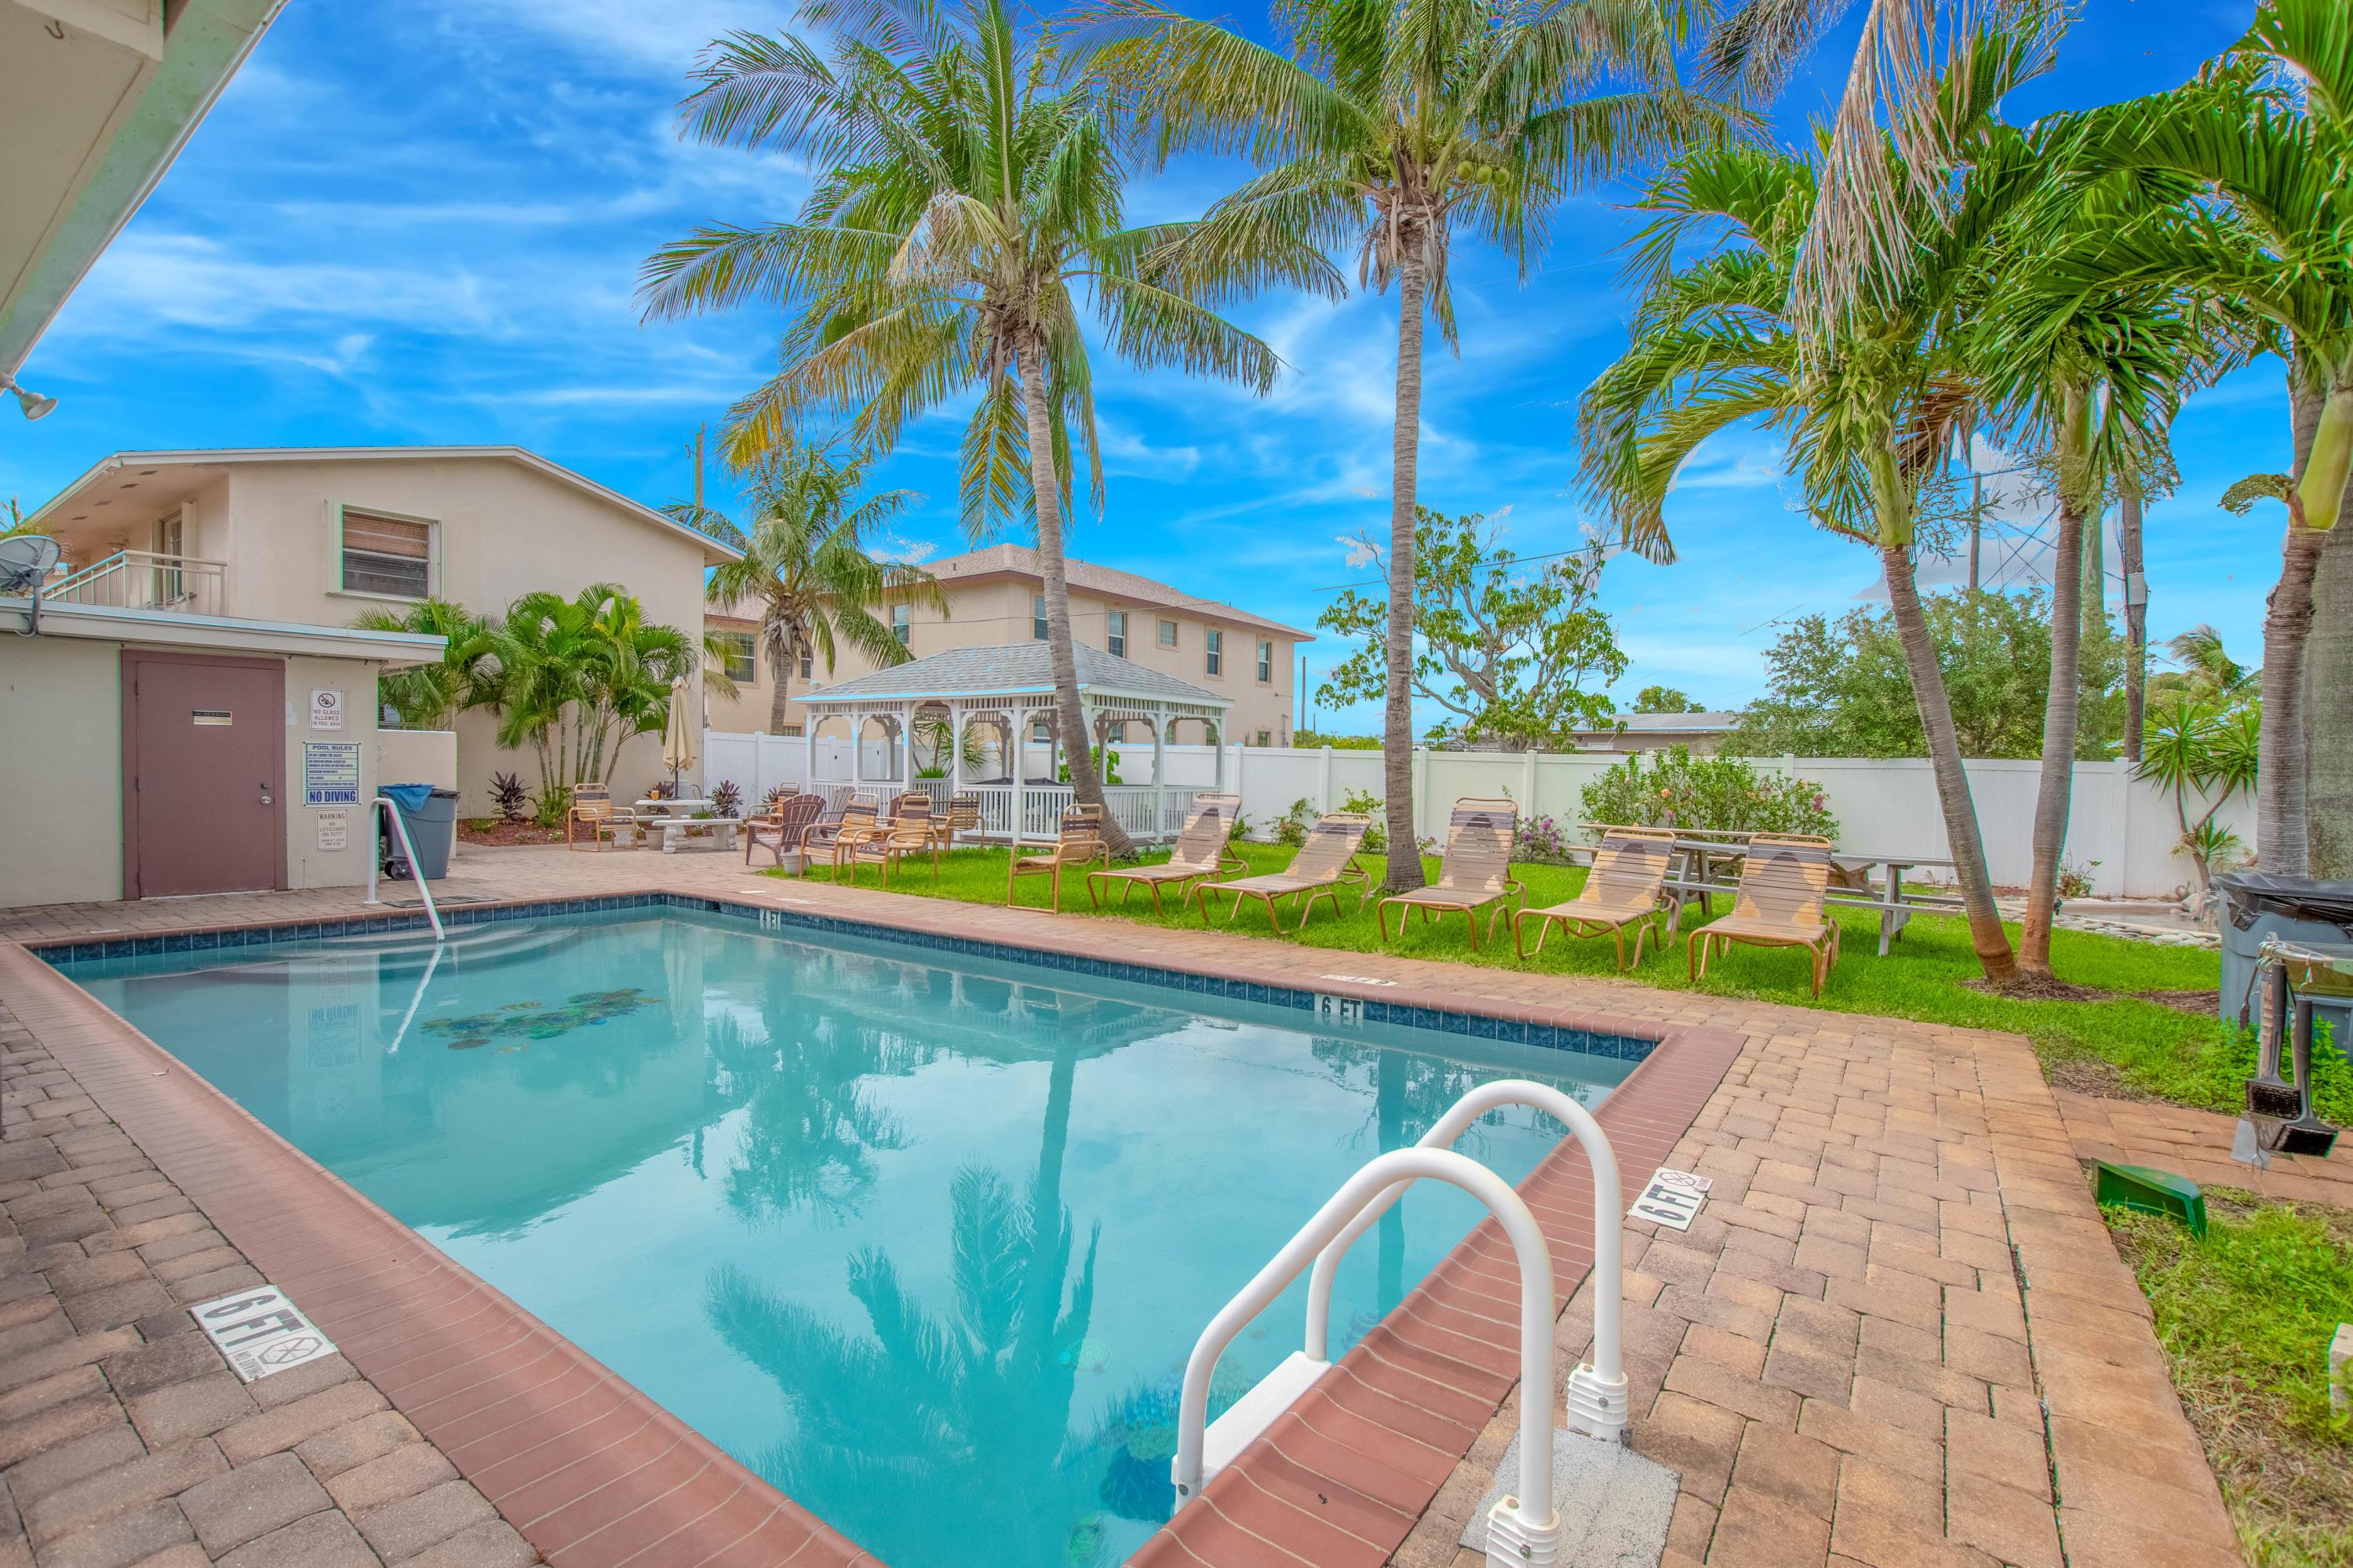 501 W Perry, Lantana, Florida 33462